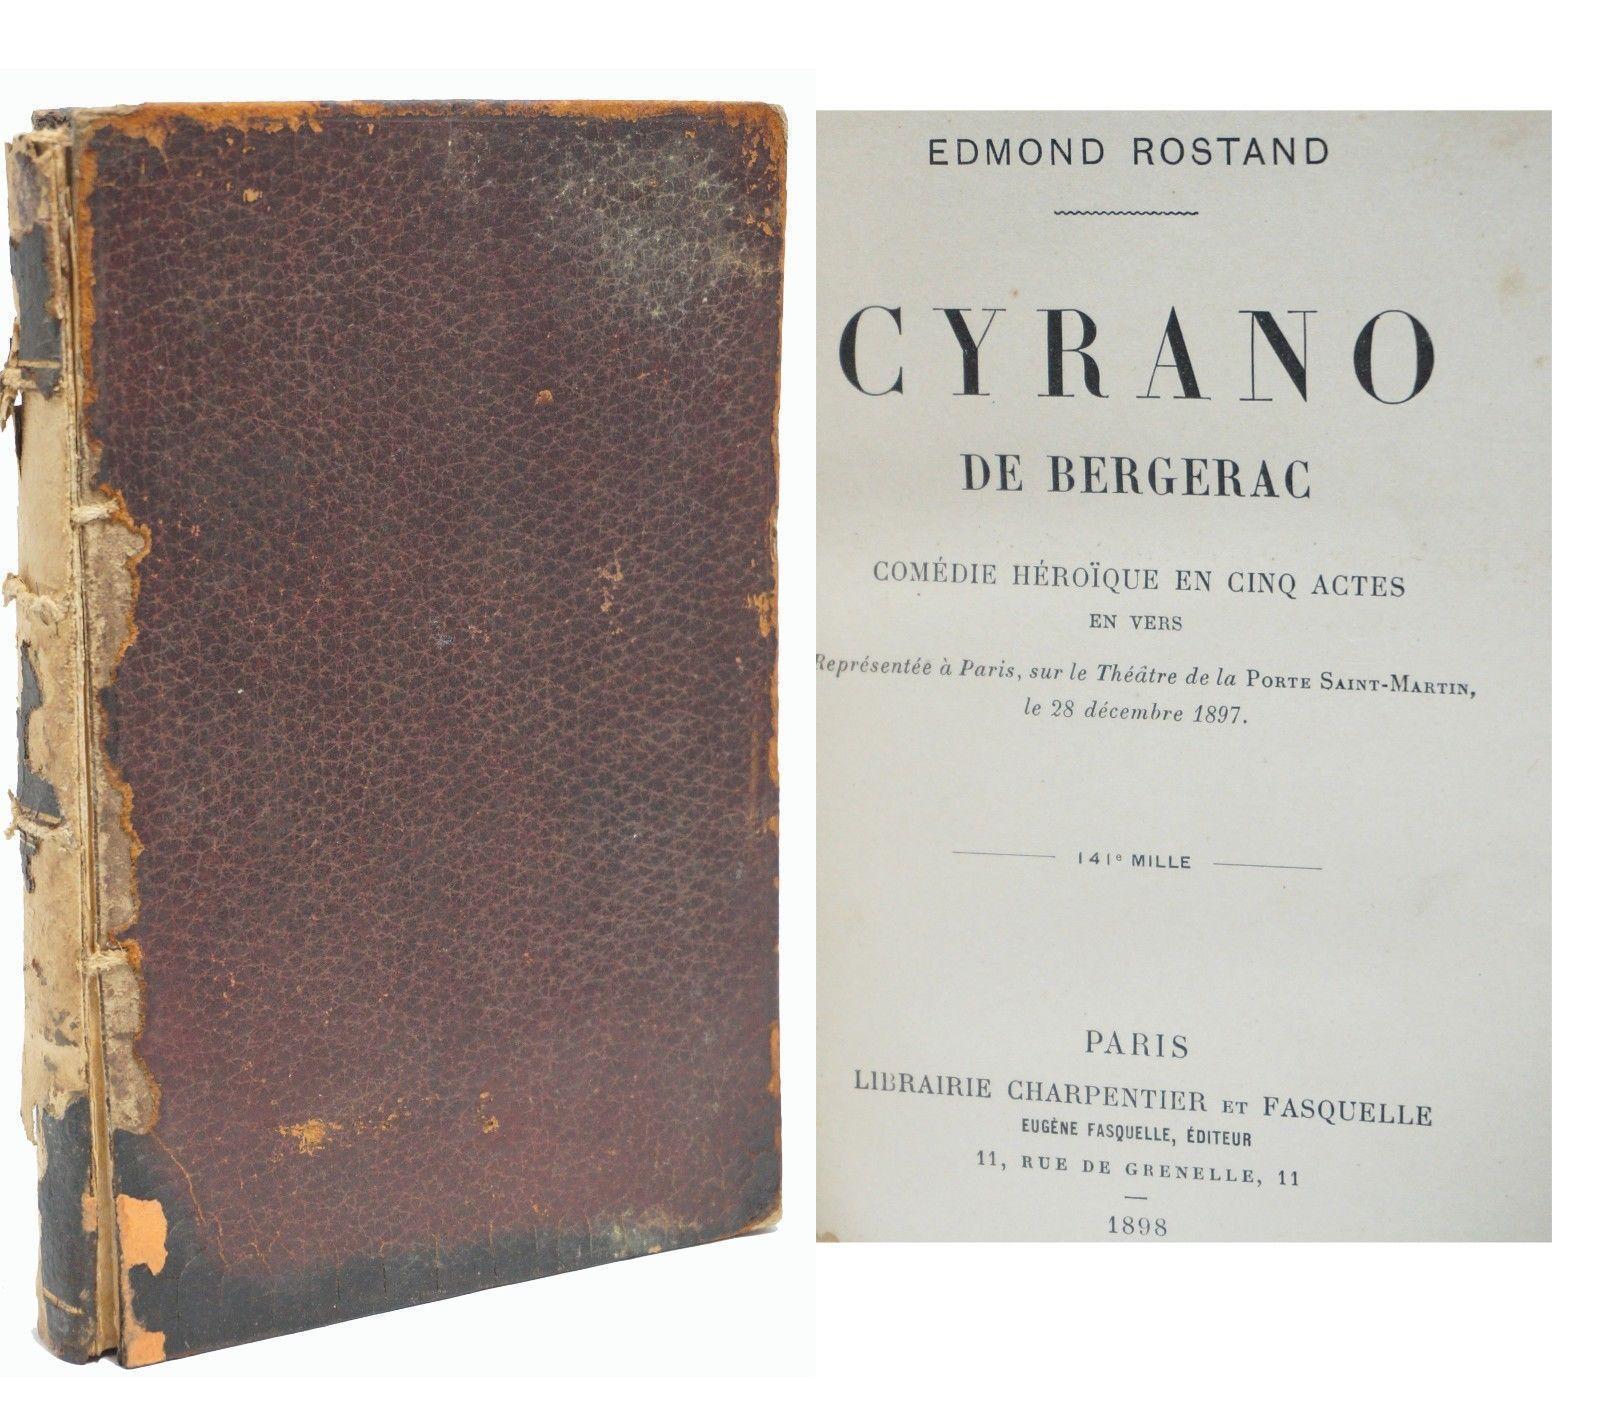 an overview of edmond rostands book cyrano de bergerac Cyrano de bergerac french vintage play script an overview of the play cyrano de bergerac book/victor  in edmond rostands cyrano de bergerac that wont.